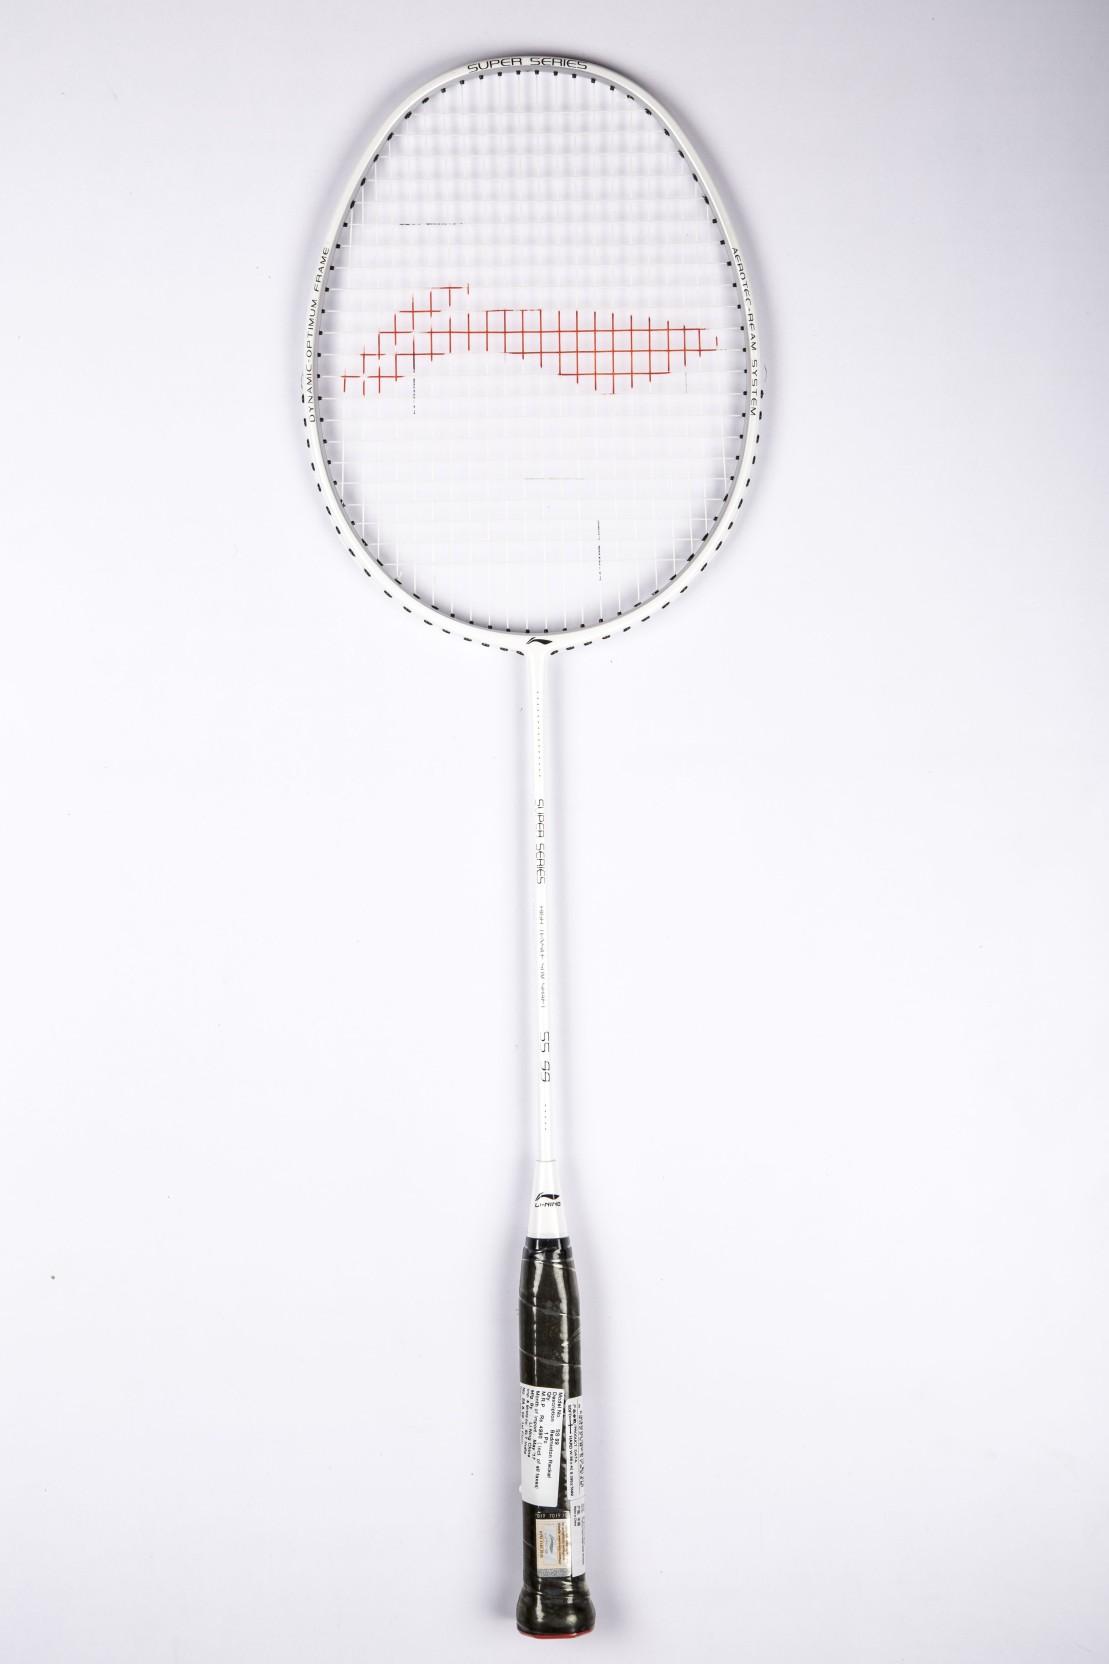 Li Ning Super Series 99 White Unstrung Badminton Racquet Buy Musi Nokha Sneakers Women Putih 39 Add To Cart Now